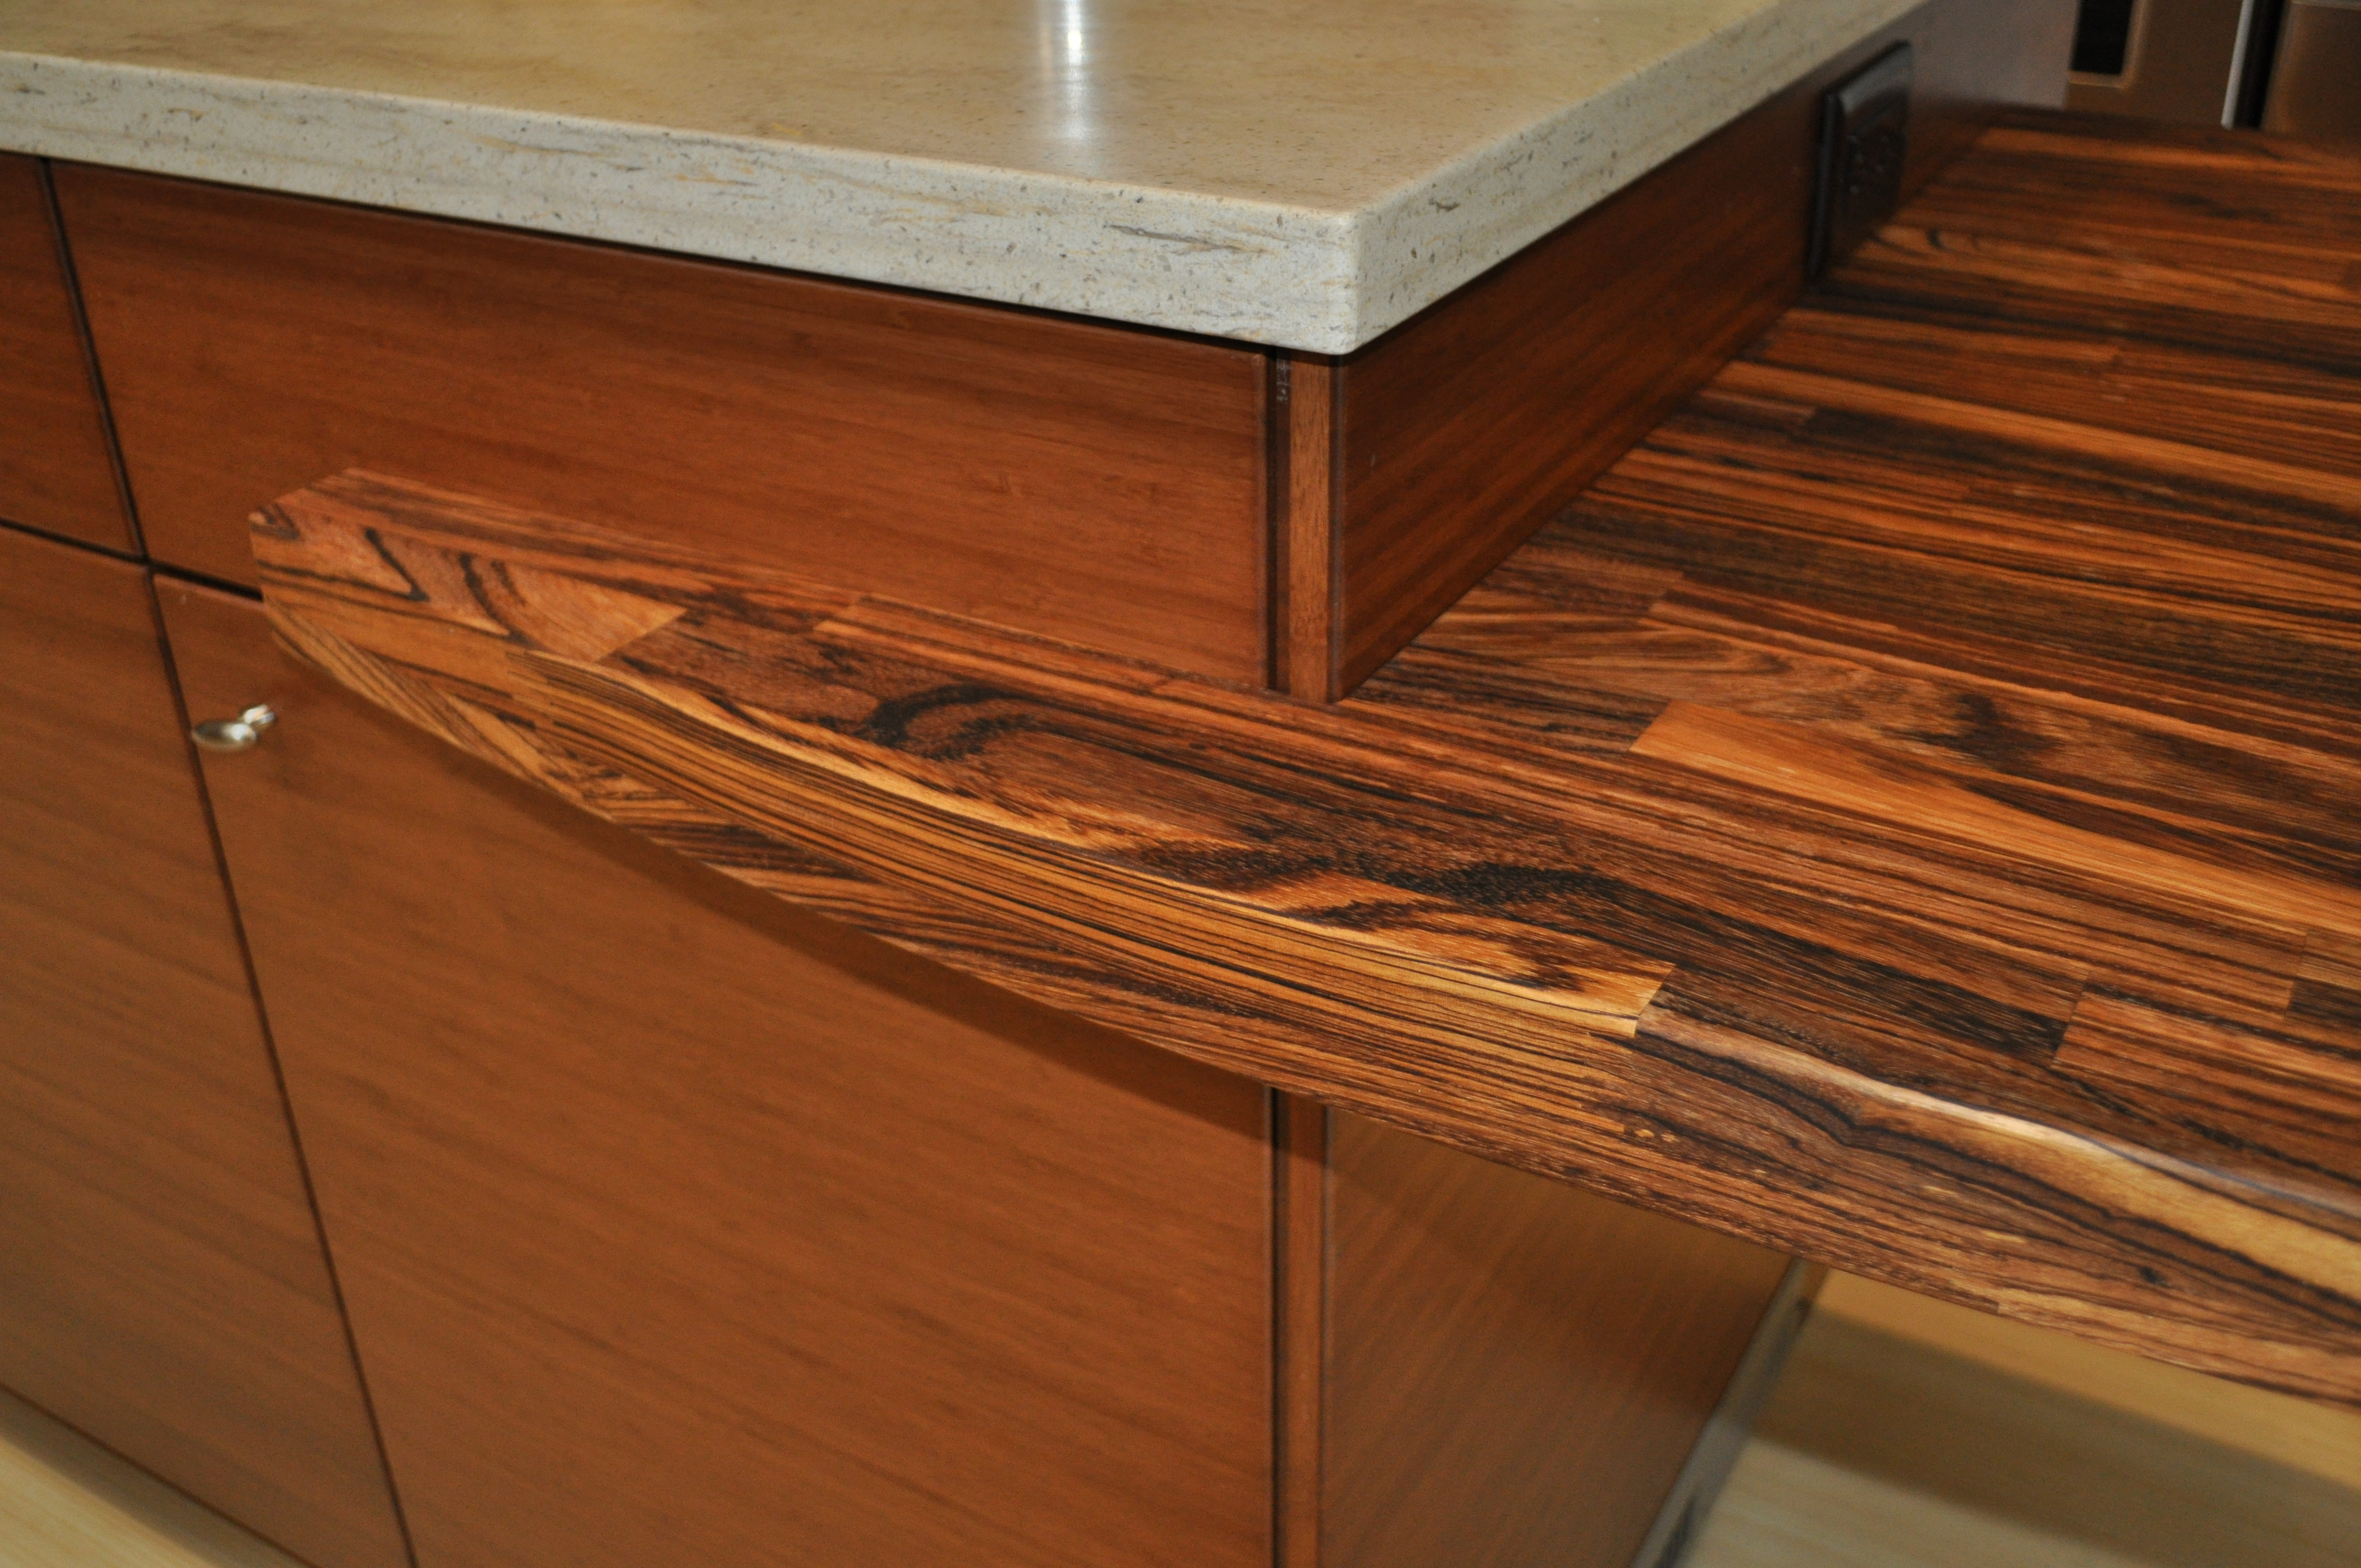 full extension drawers  Sacramento Kitchen Design Blog